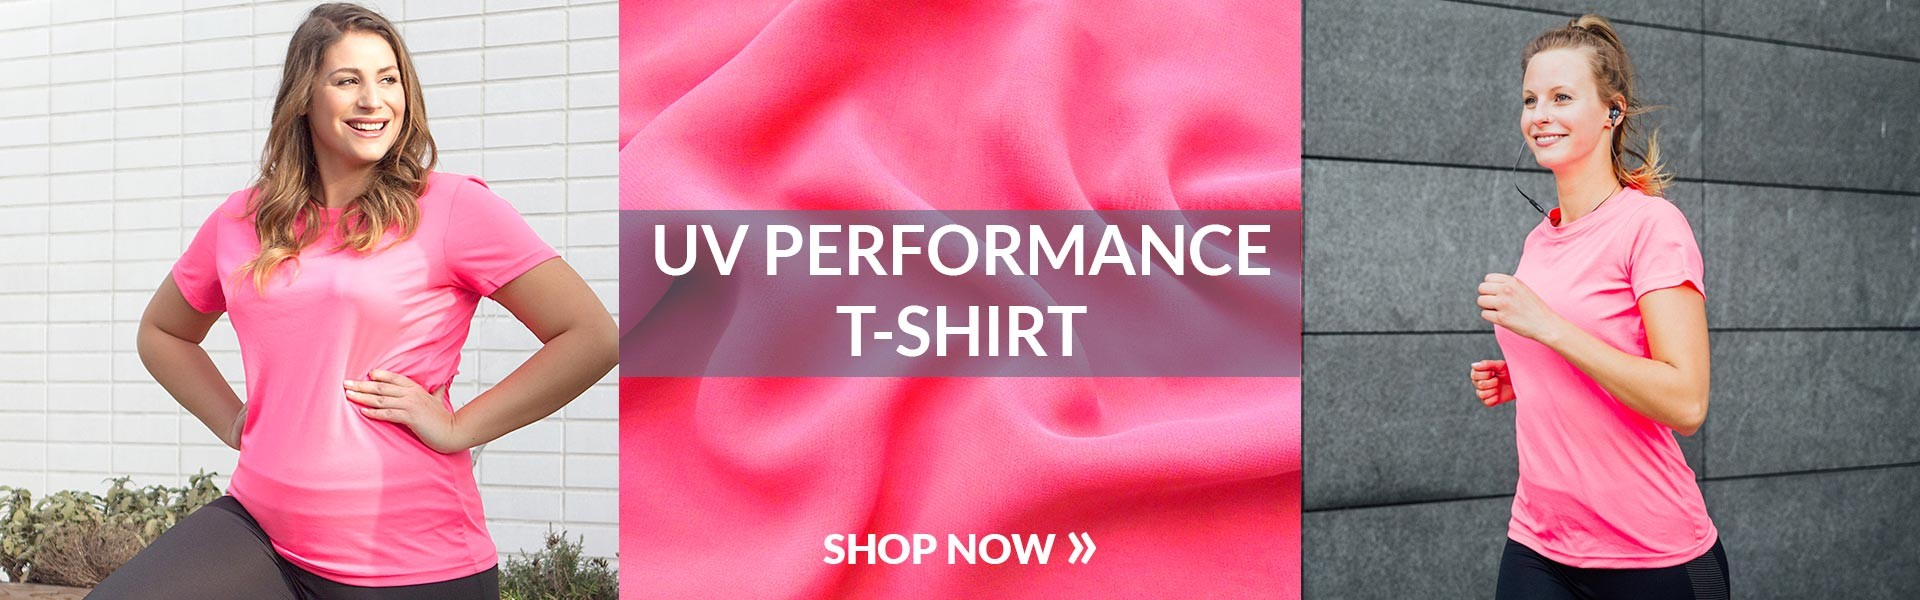 Functional T-Shirts women promodoro